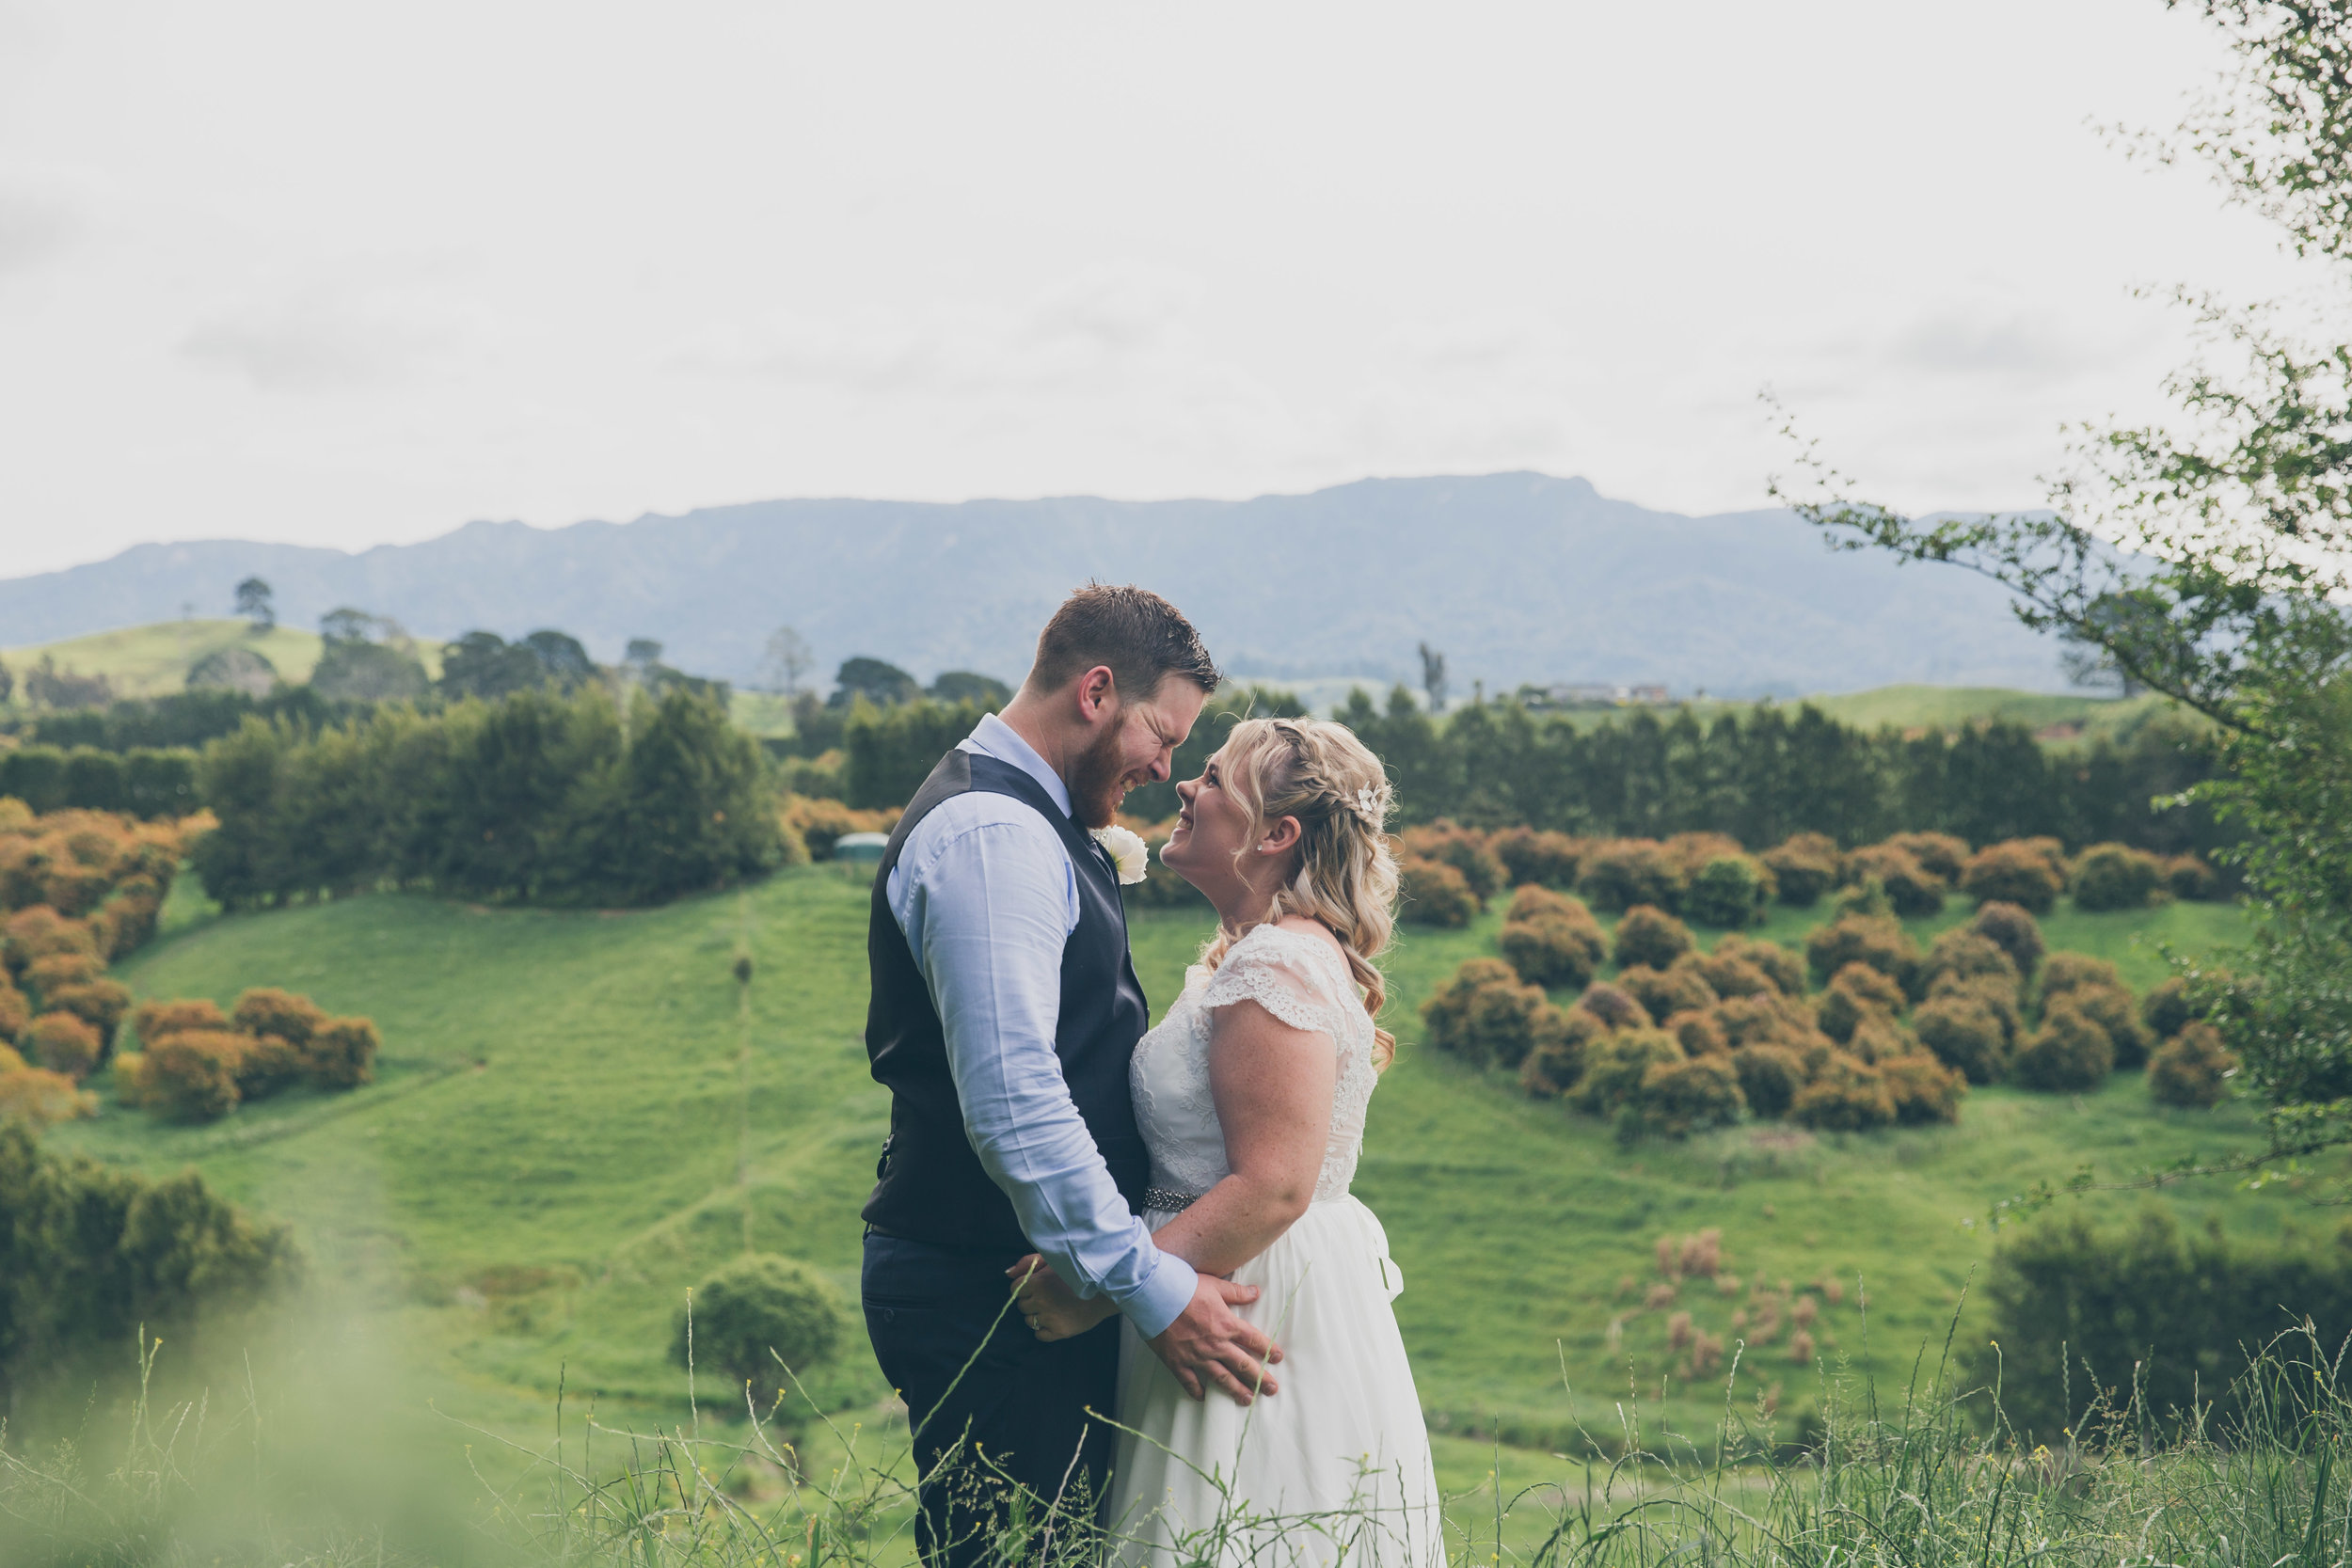 K & S - Wedding - Oh Joy! Photography - Tauranga, New Zealand-6.jpg